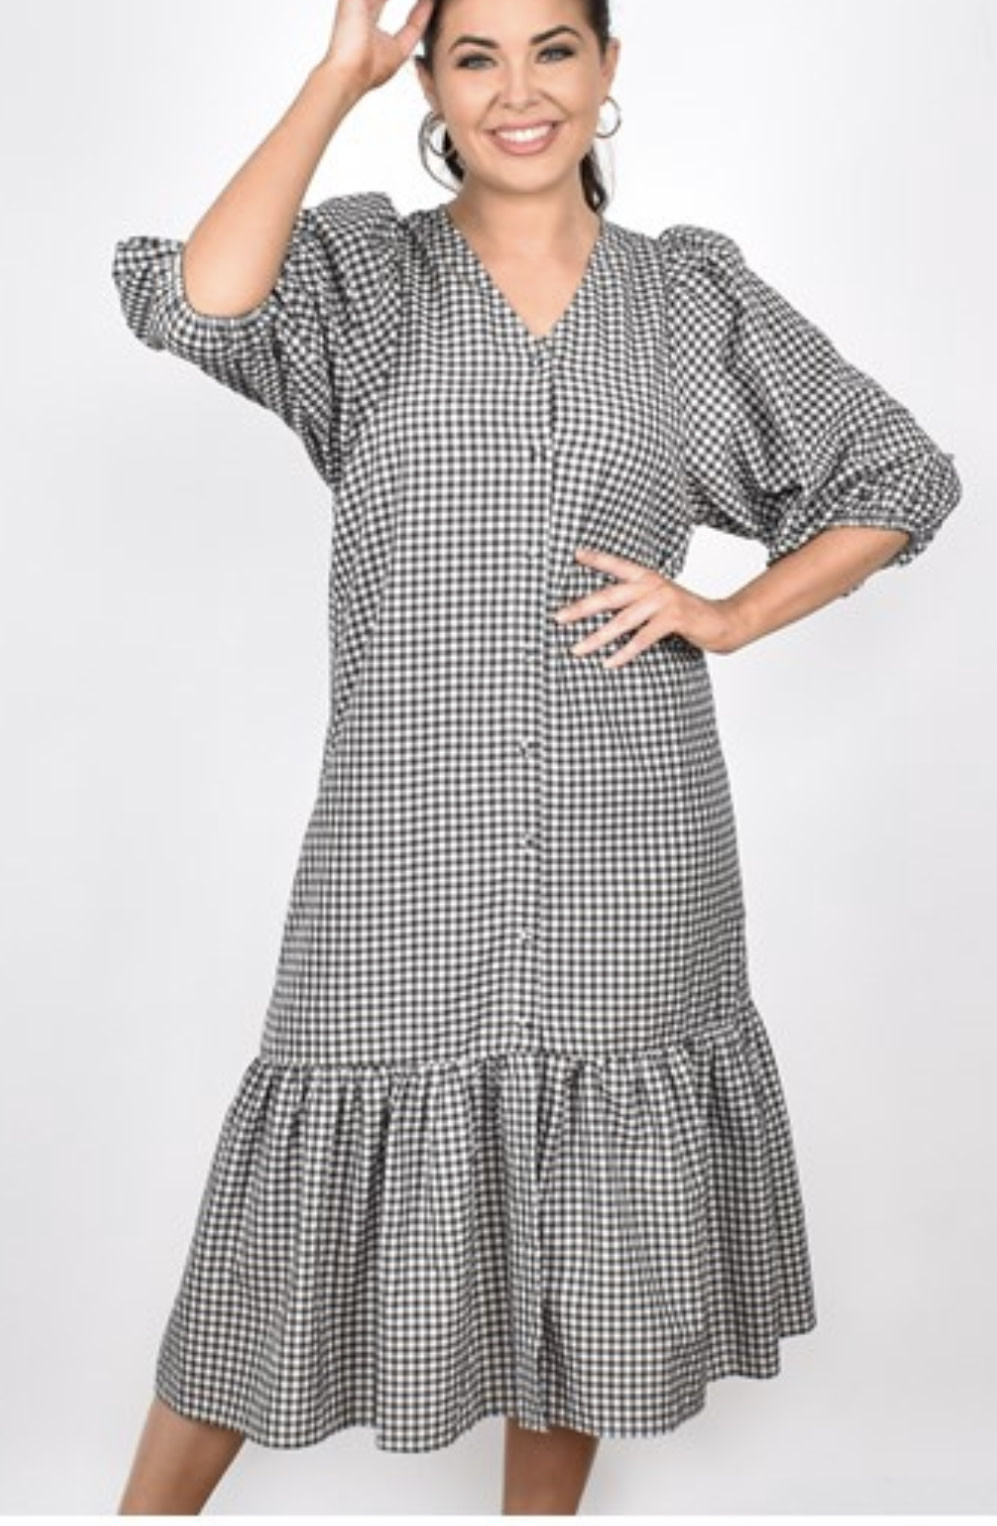 Gracie Long sleeved check dress (K)